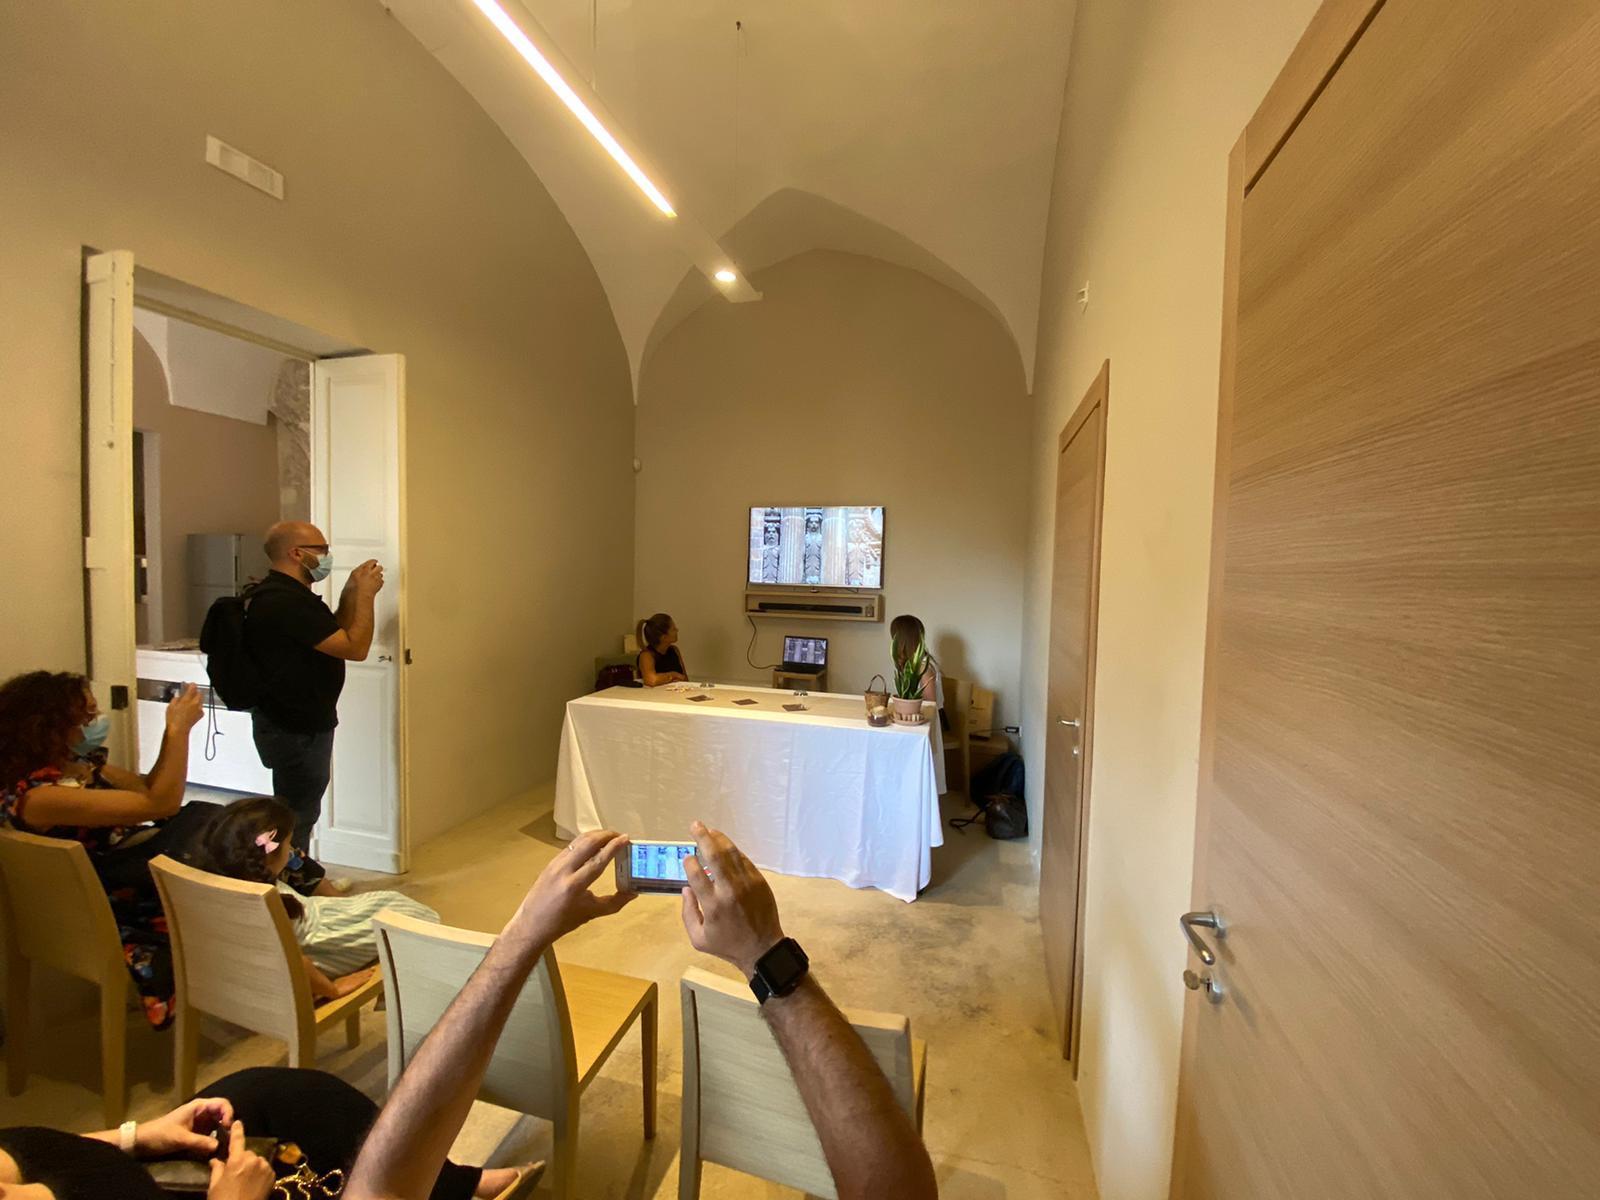 presentazione-www.visitnardo.it_1